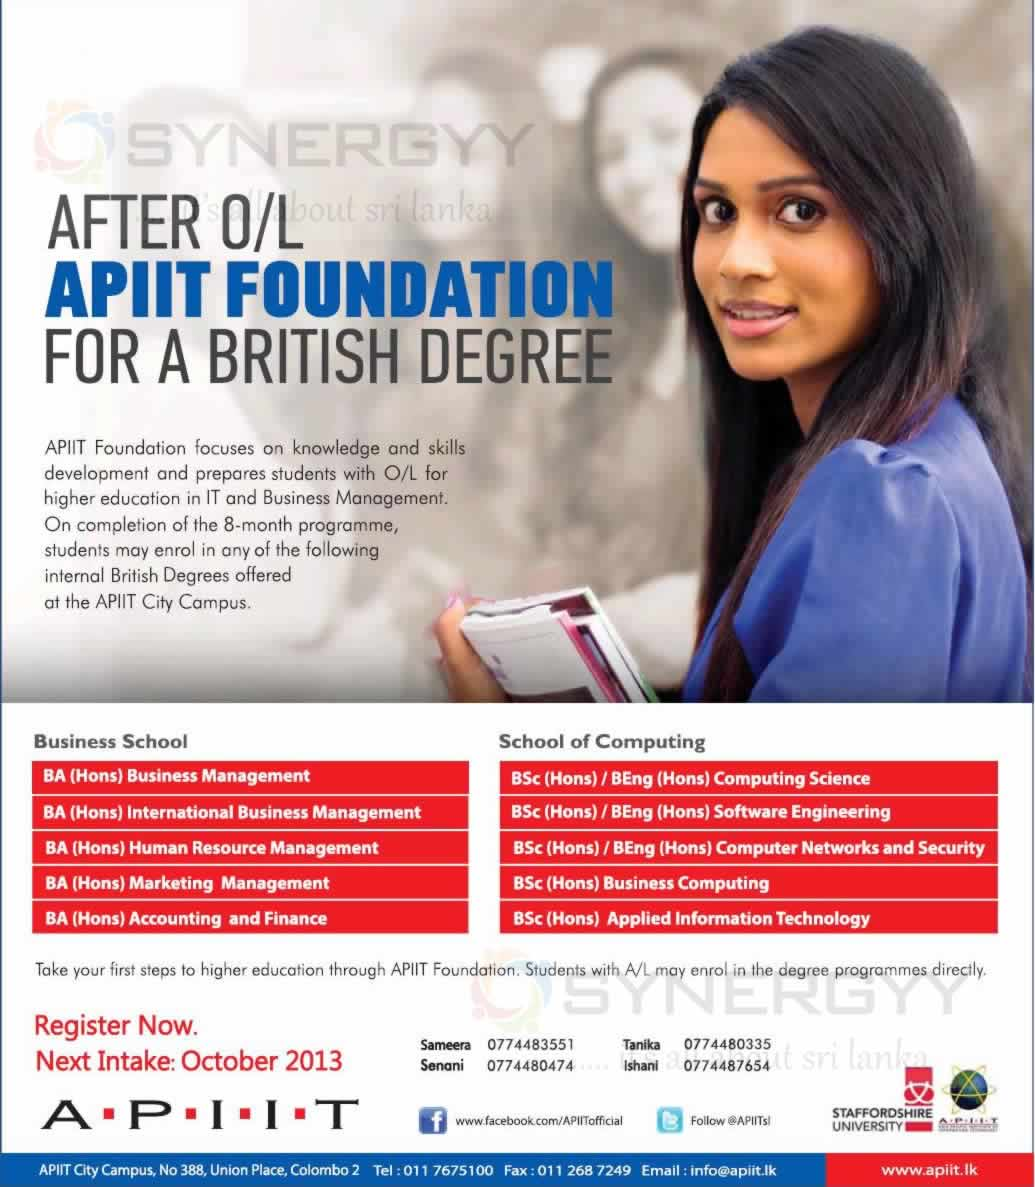 Degree Programmes After O/L In Sri Lanka At APIIT